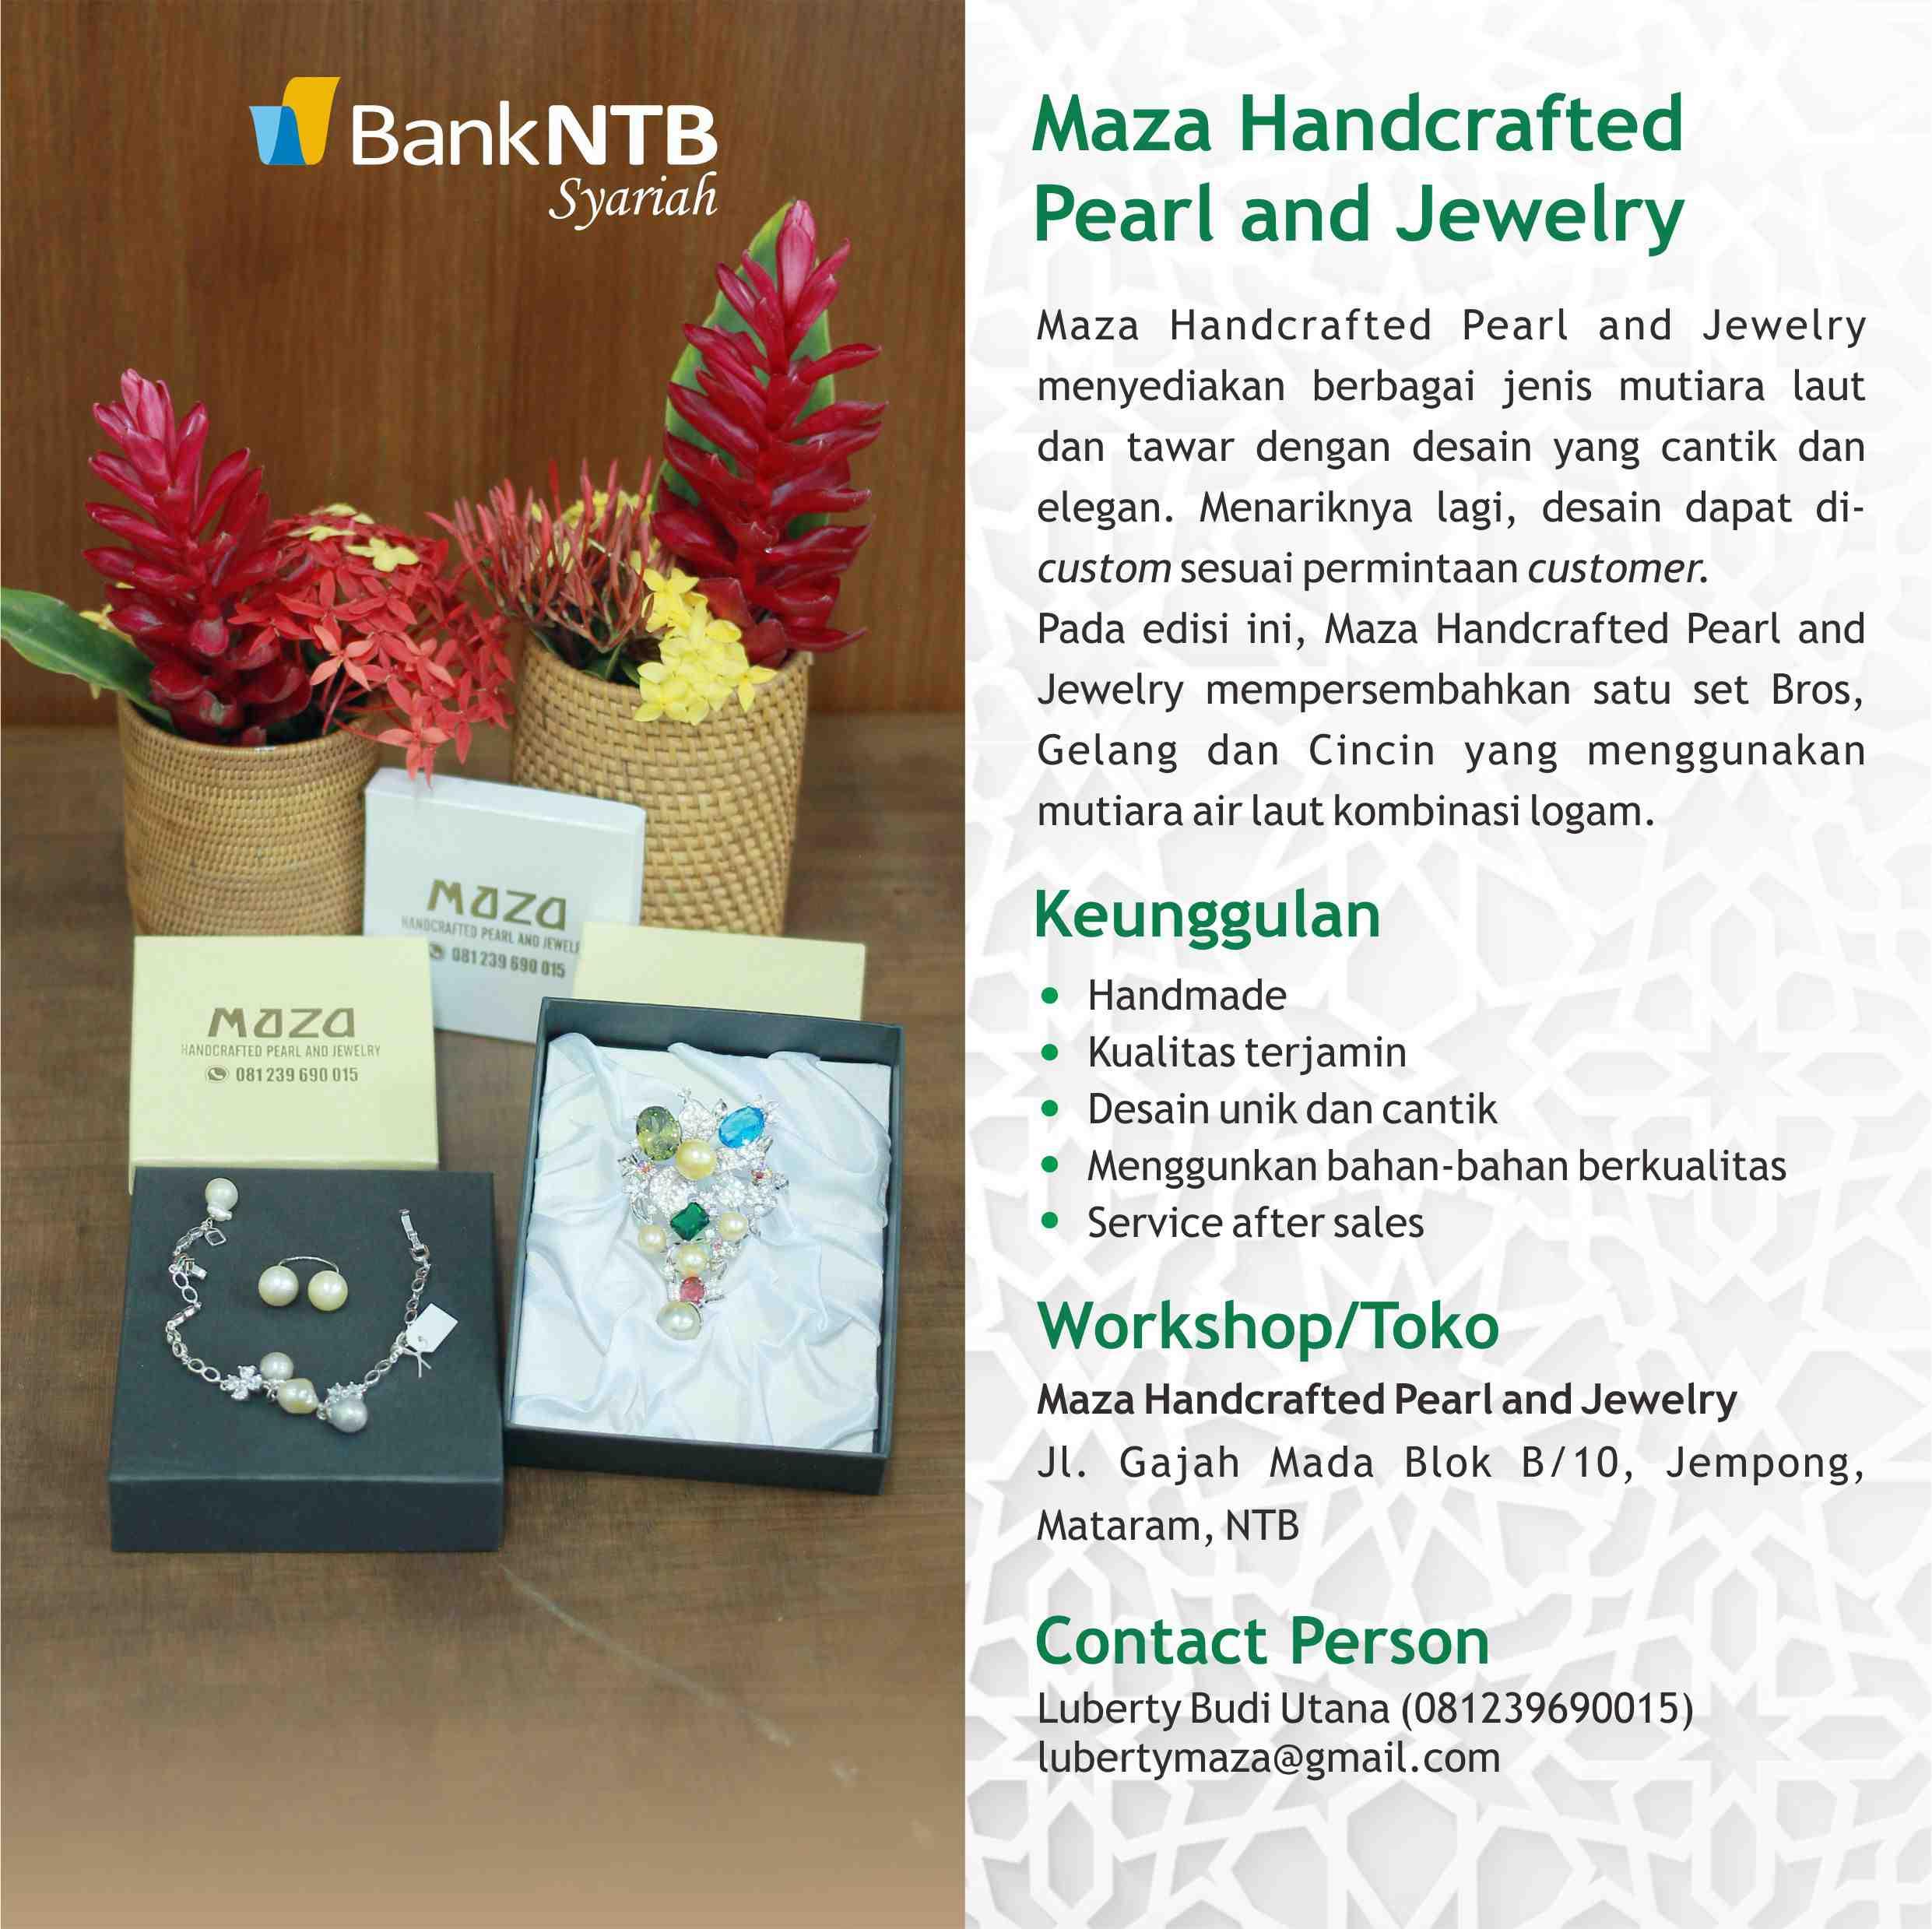 Maza_Handcrafted_Pearl_Jewelry